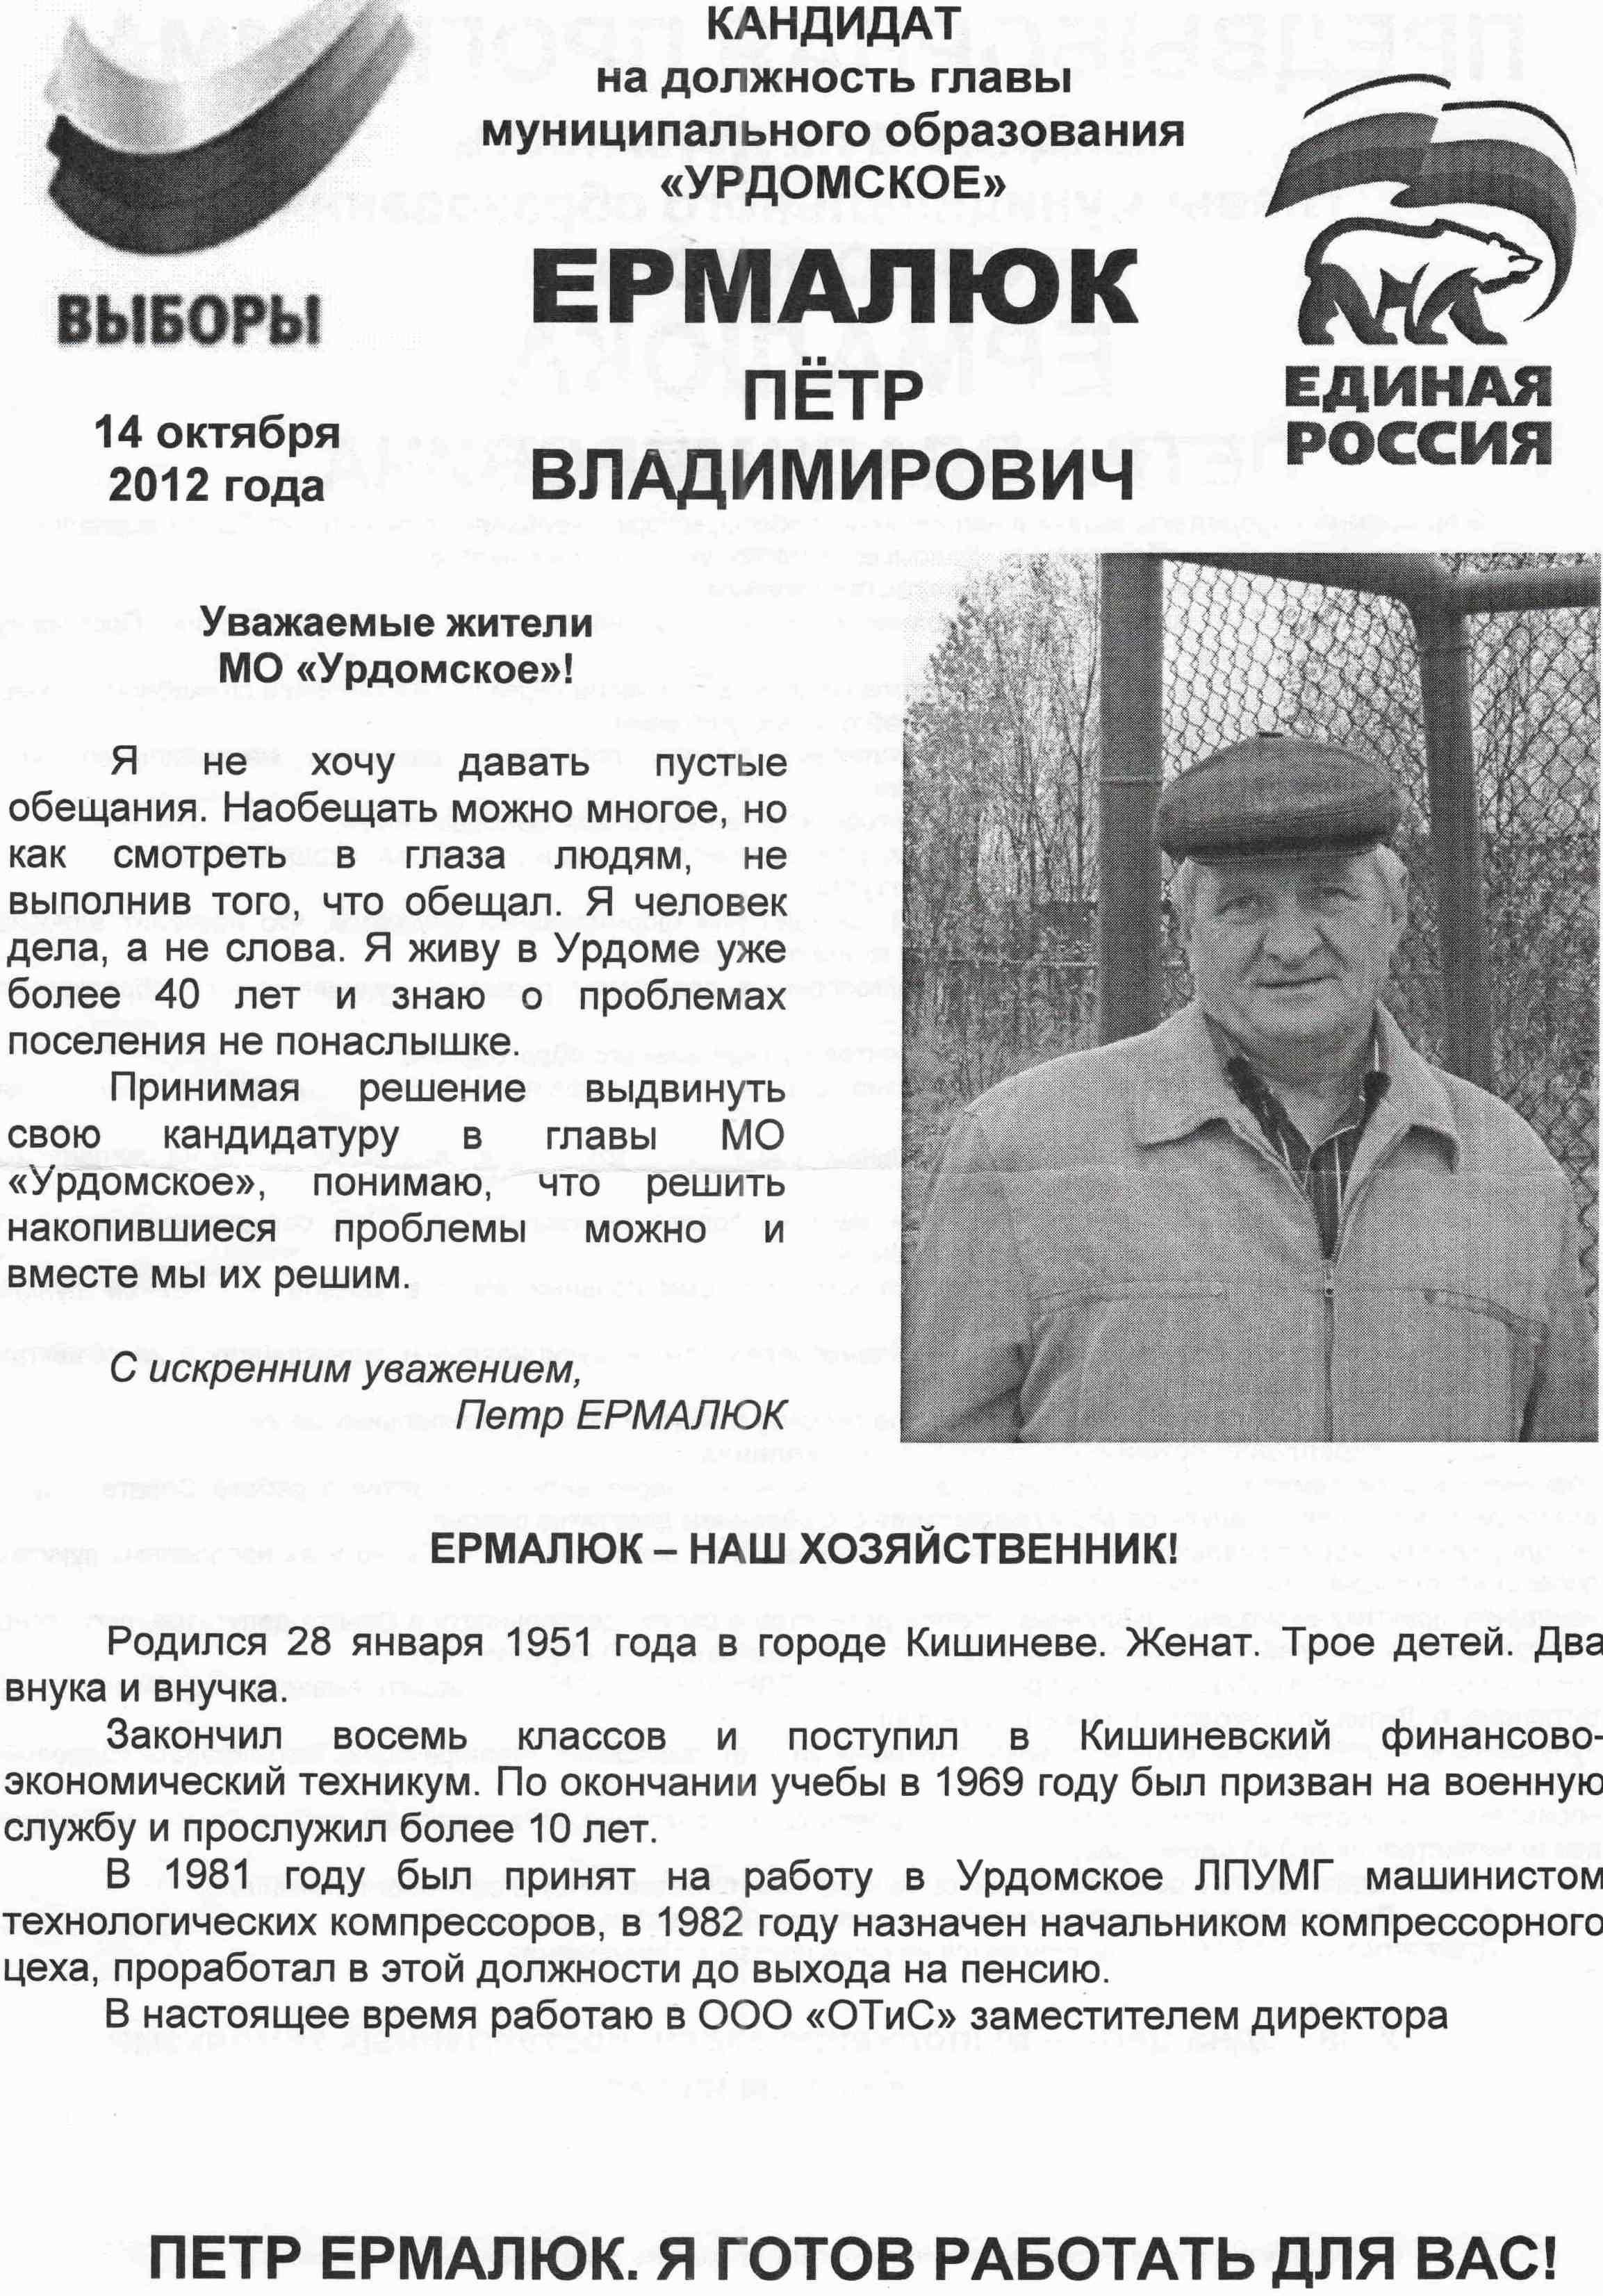 Ермалюк ПВ, кандидат